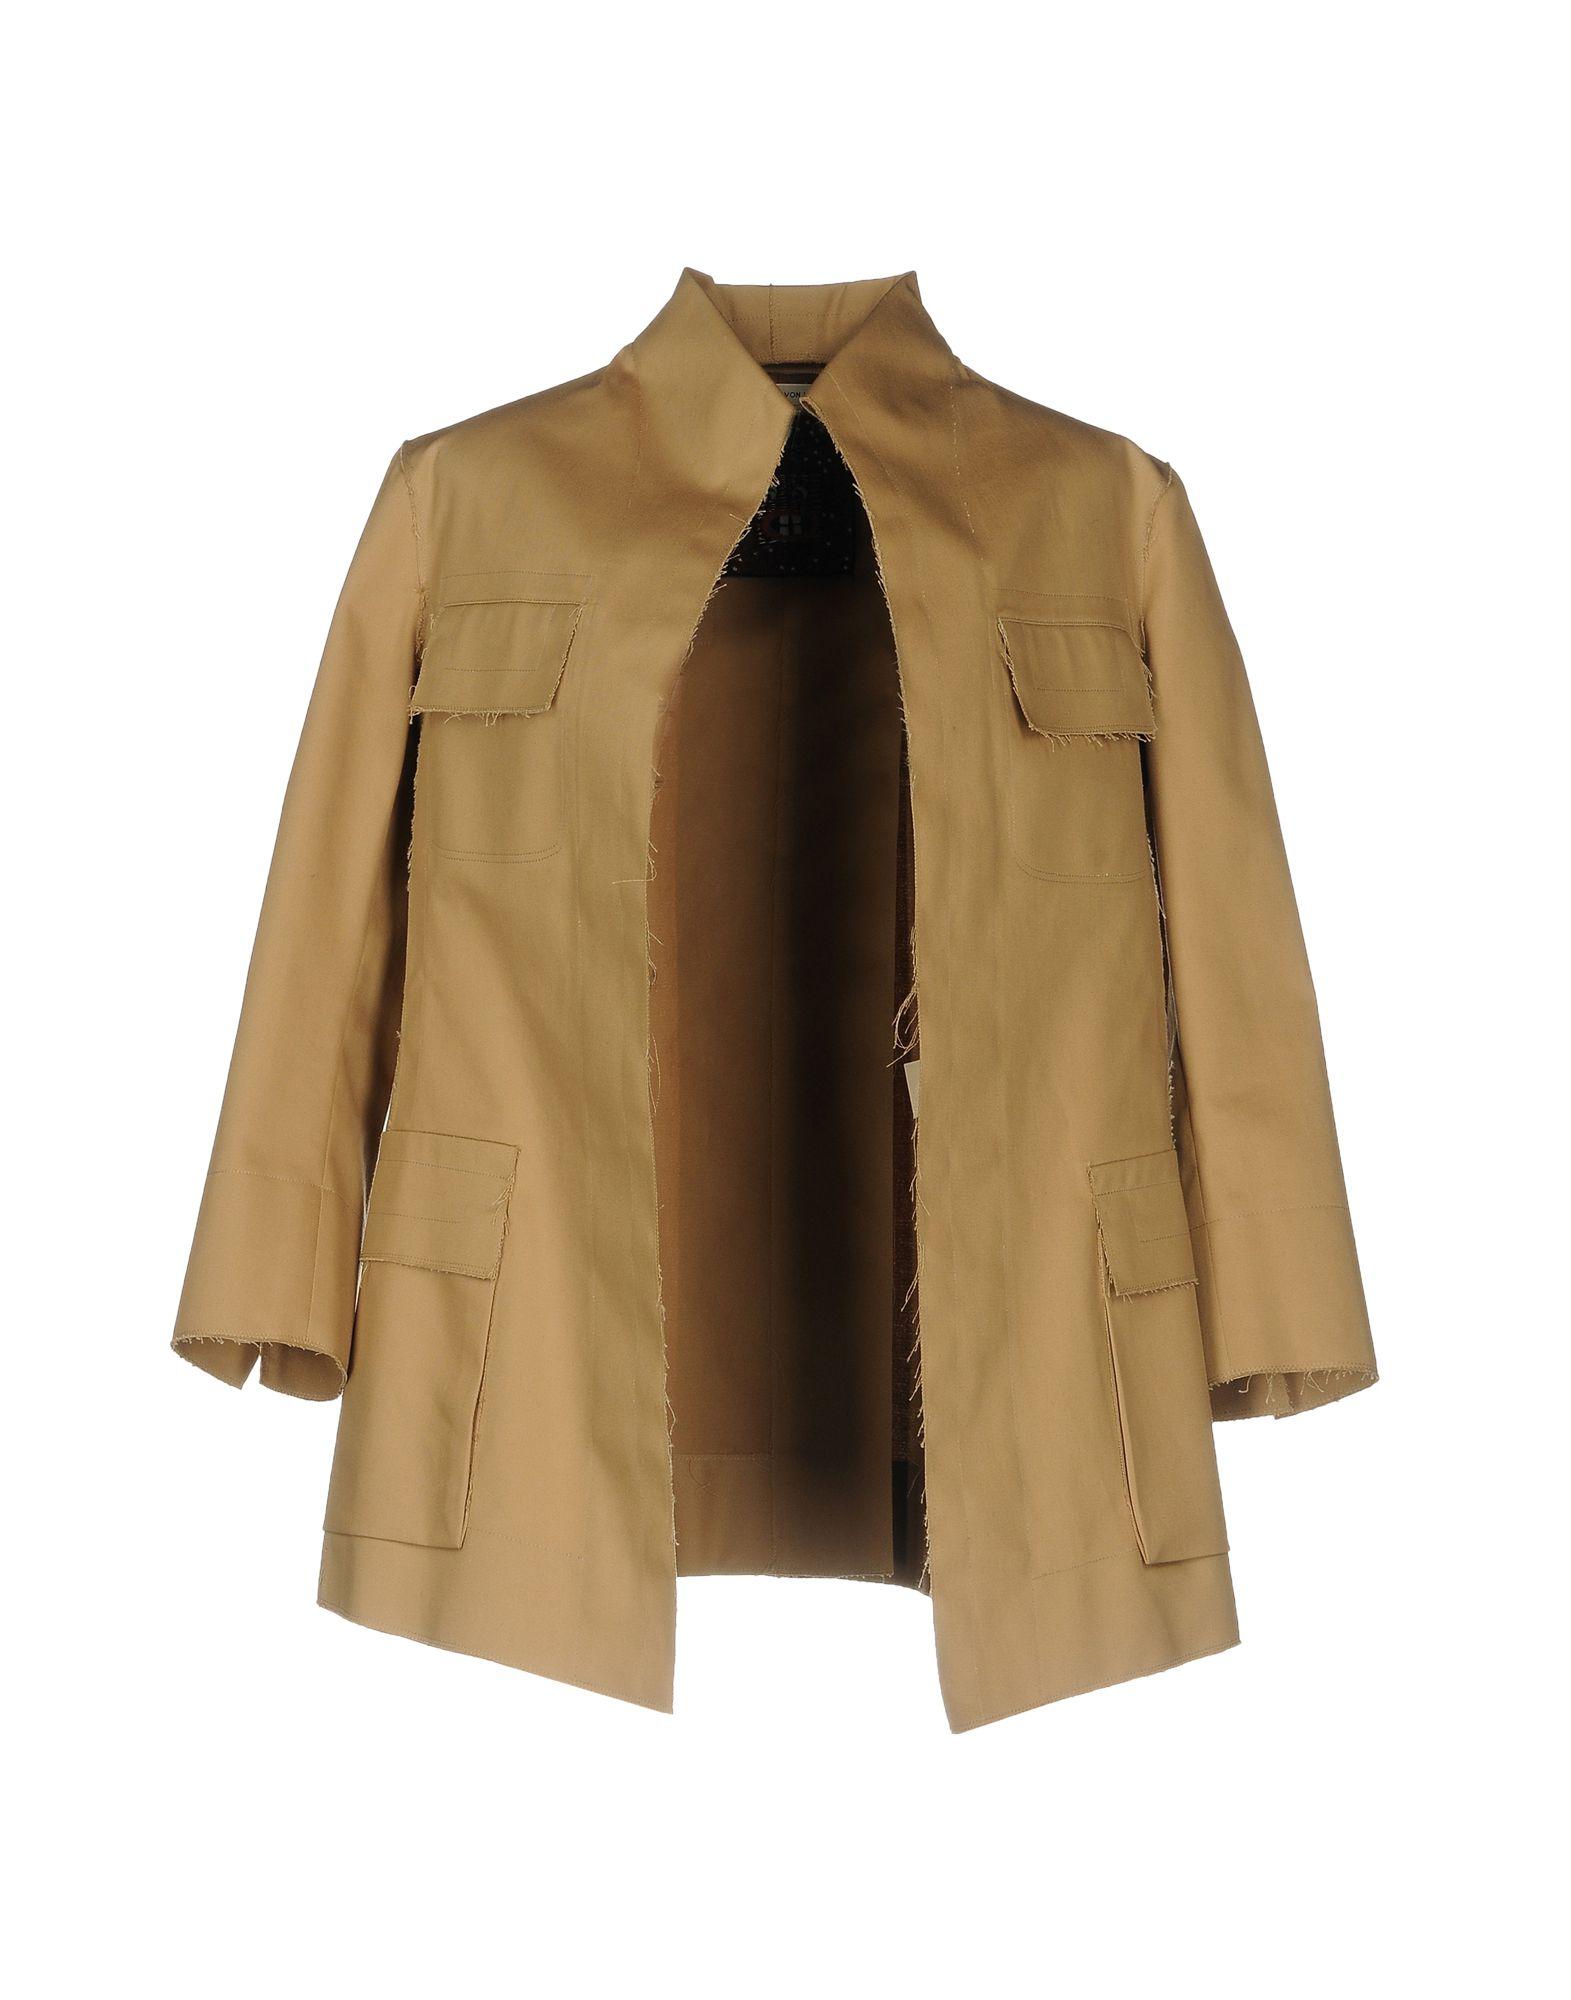 MAFALDA VON HESSEN Full-Length Jacket in Camel